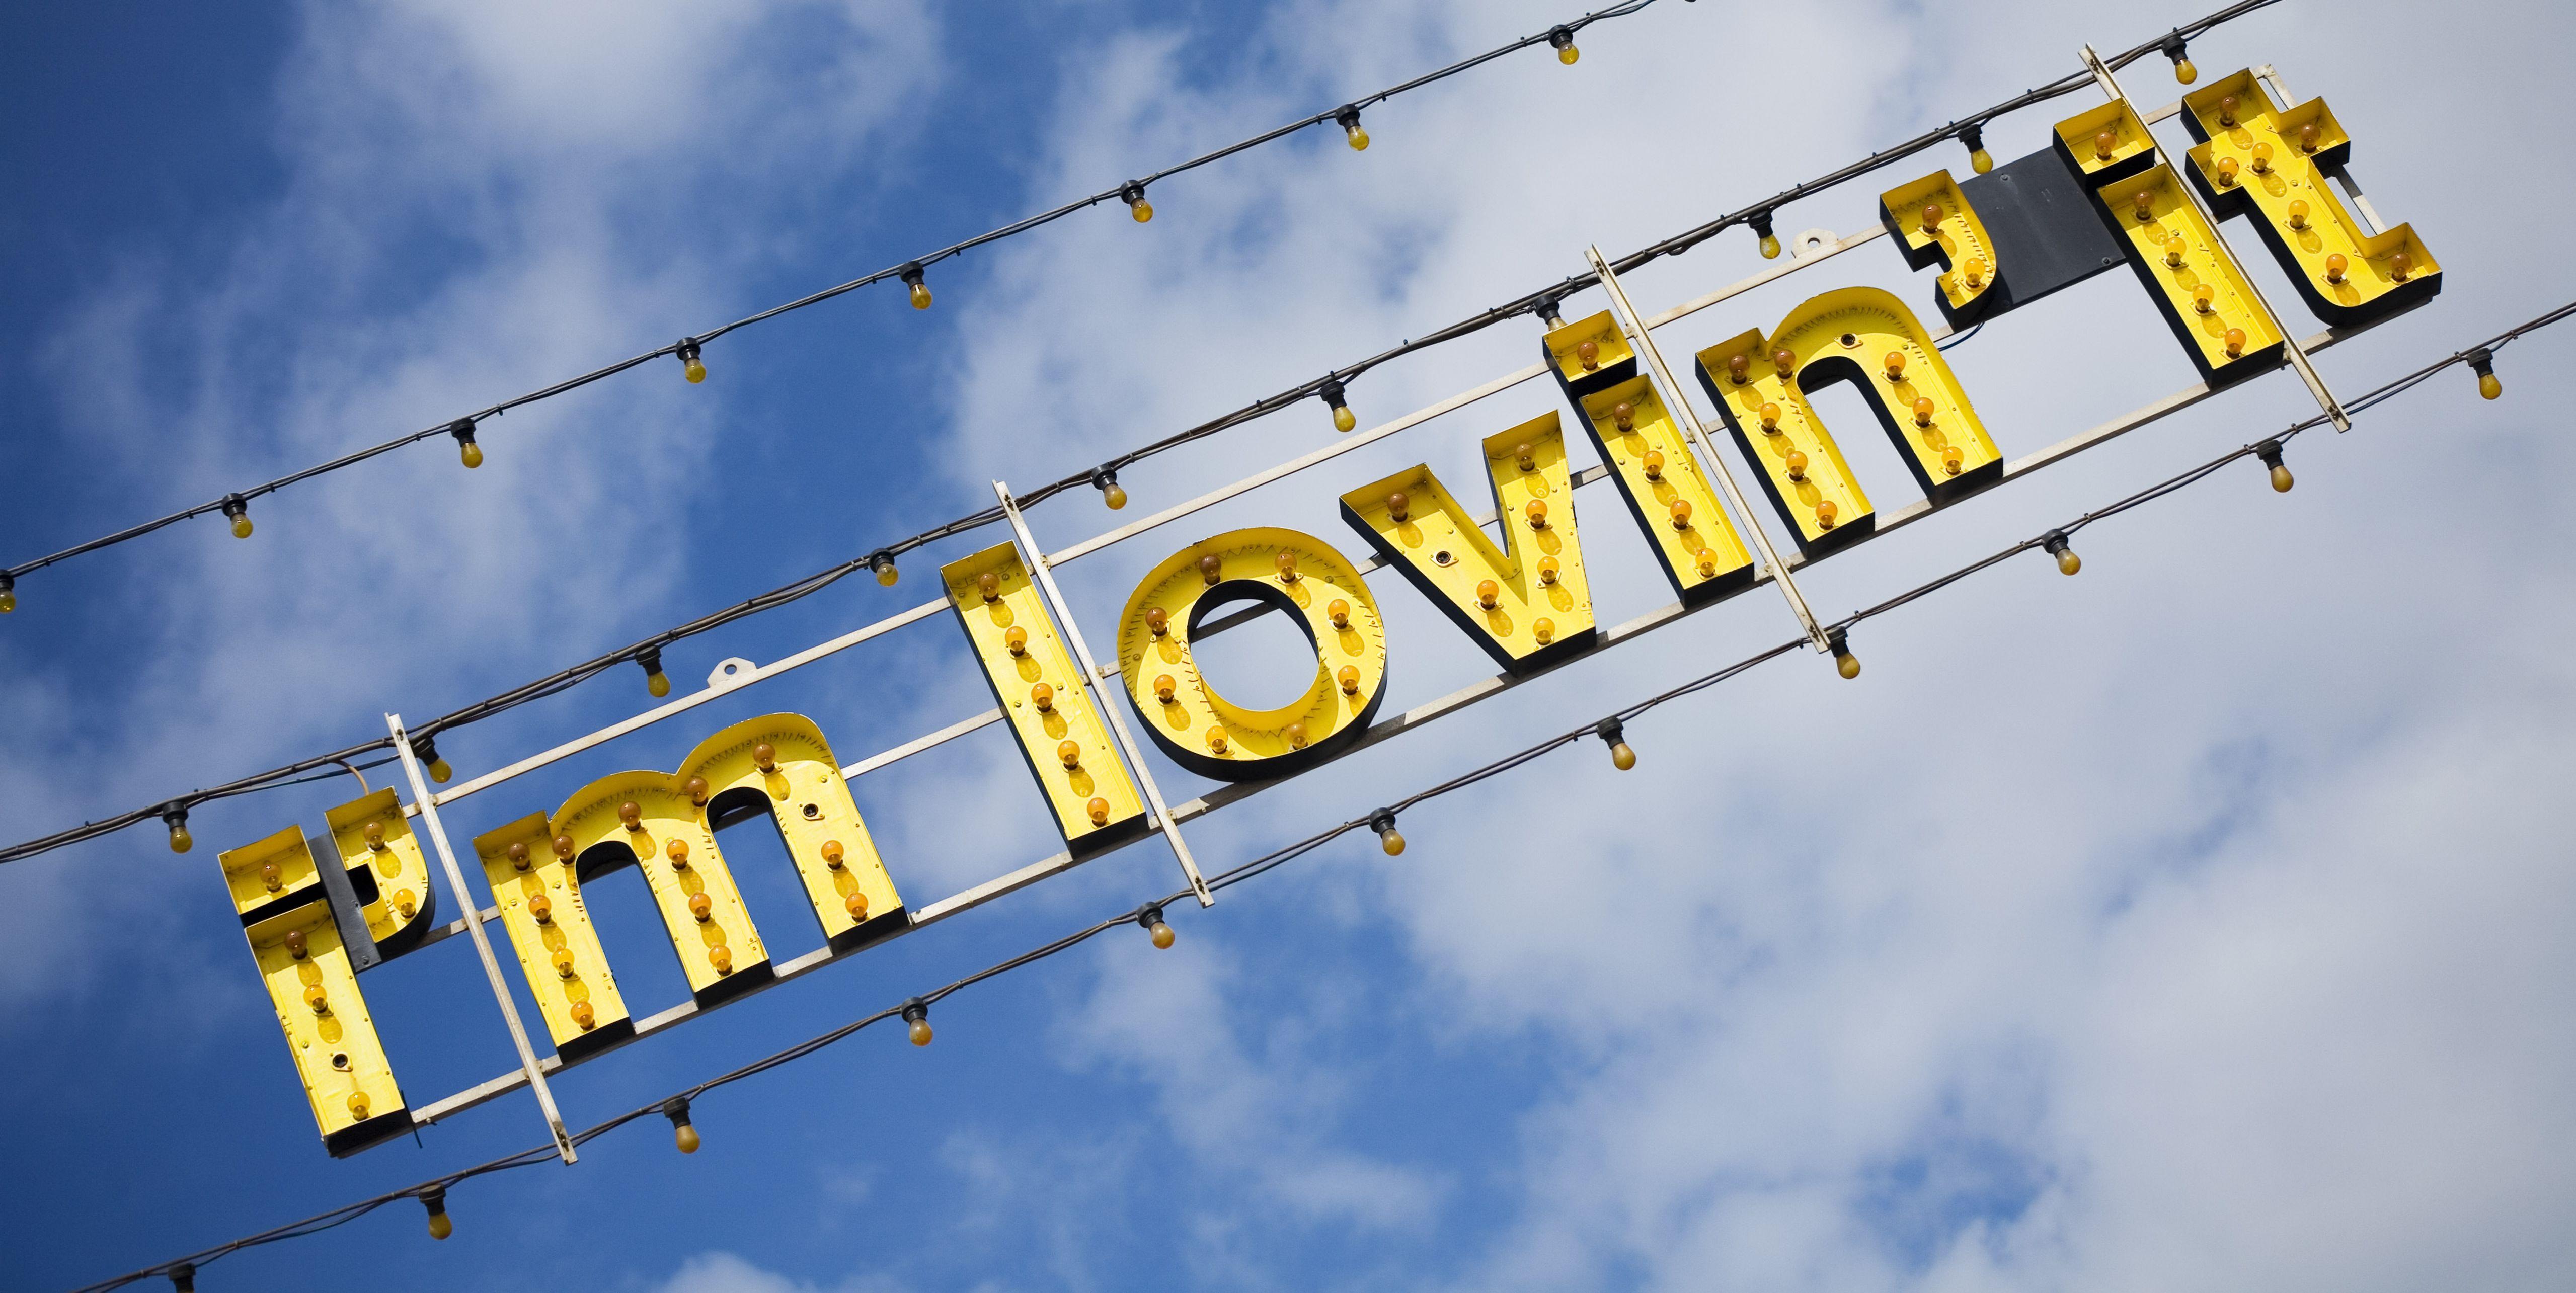 Blackpool Illuminations, McDonalds catchphrase, 'I'm Lovin' It'